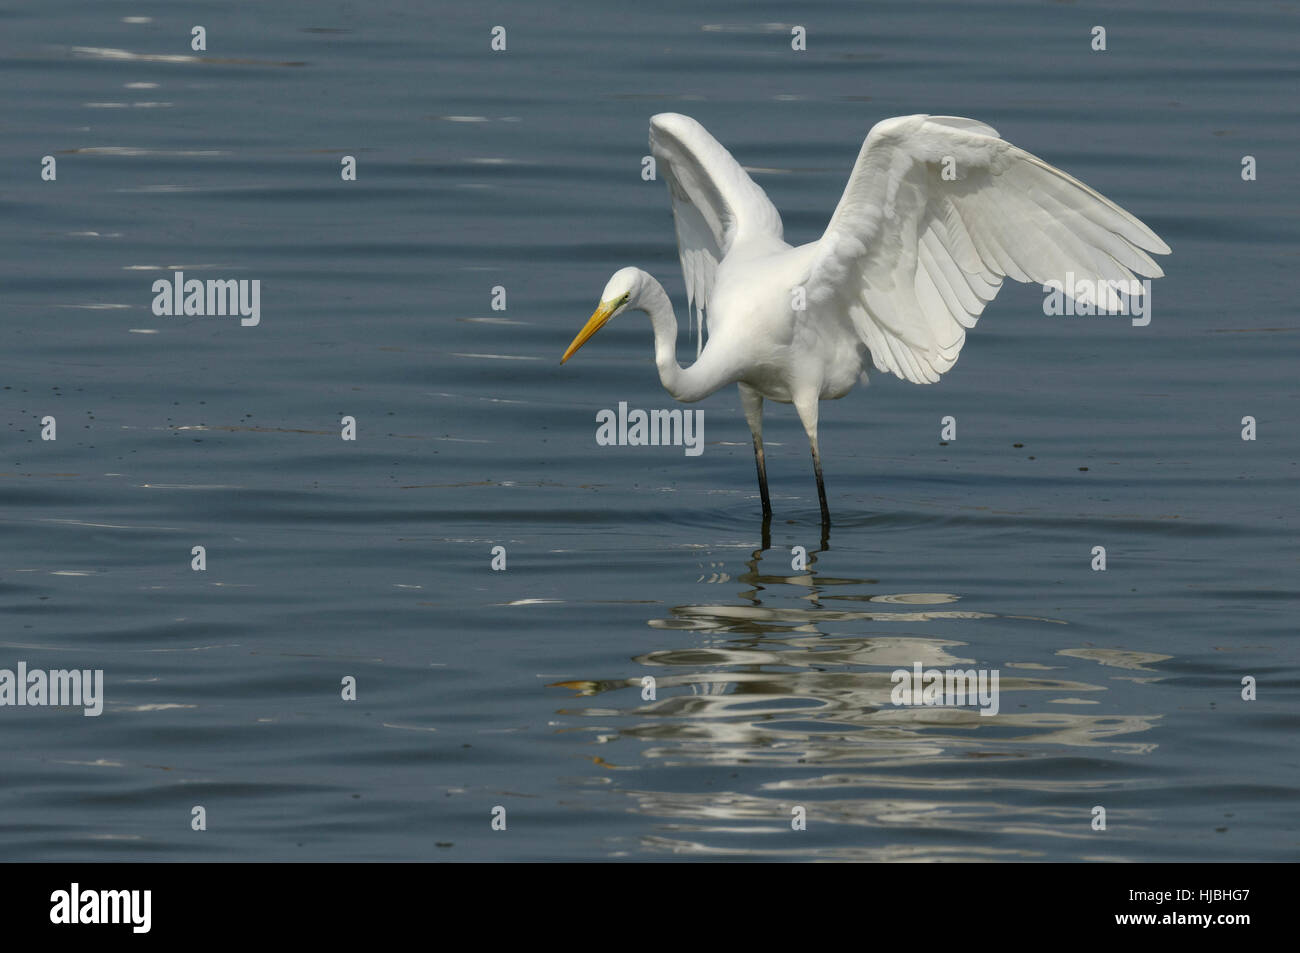 Great egret (Egretta alba) hunting fish in coastal lagoon, on Israel's Mediterranean coast. - Stock Image